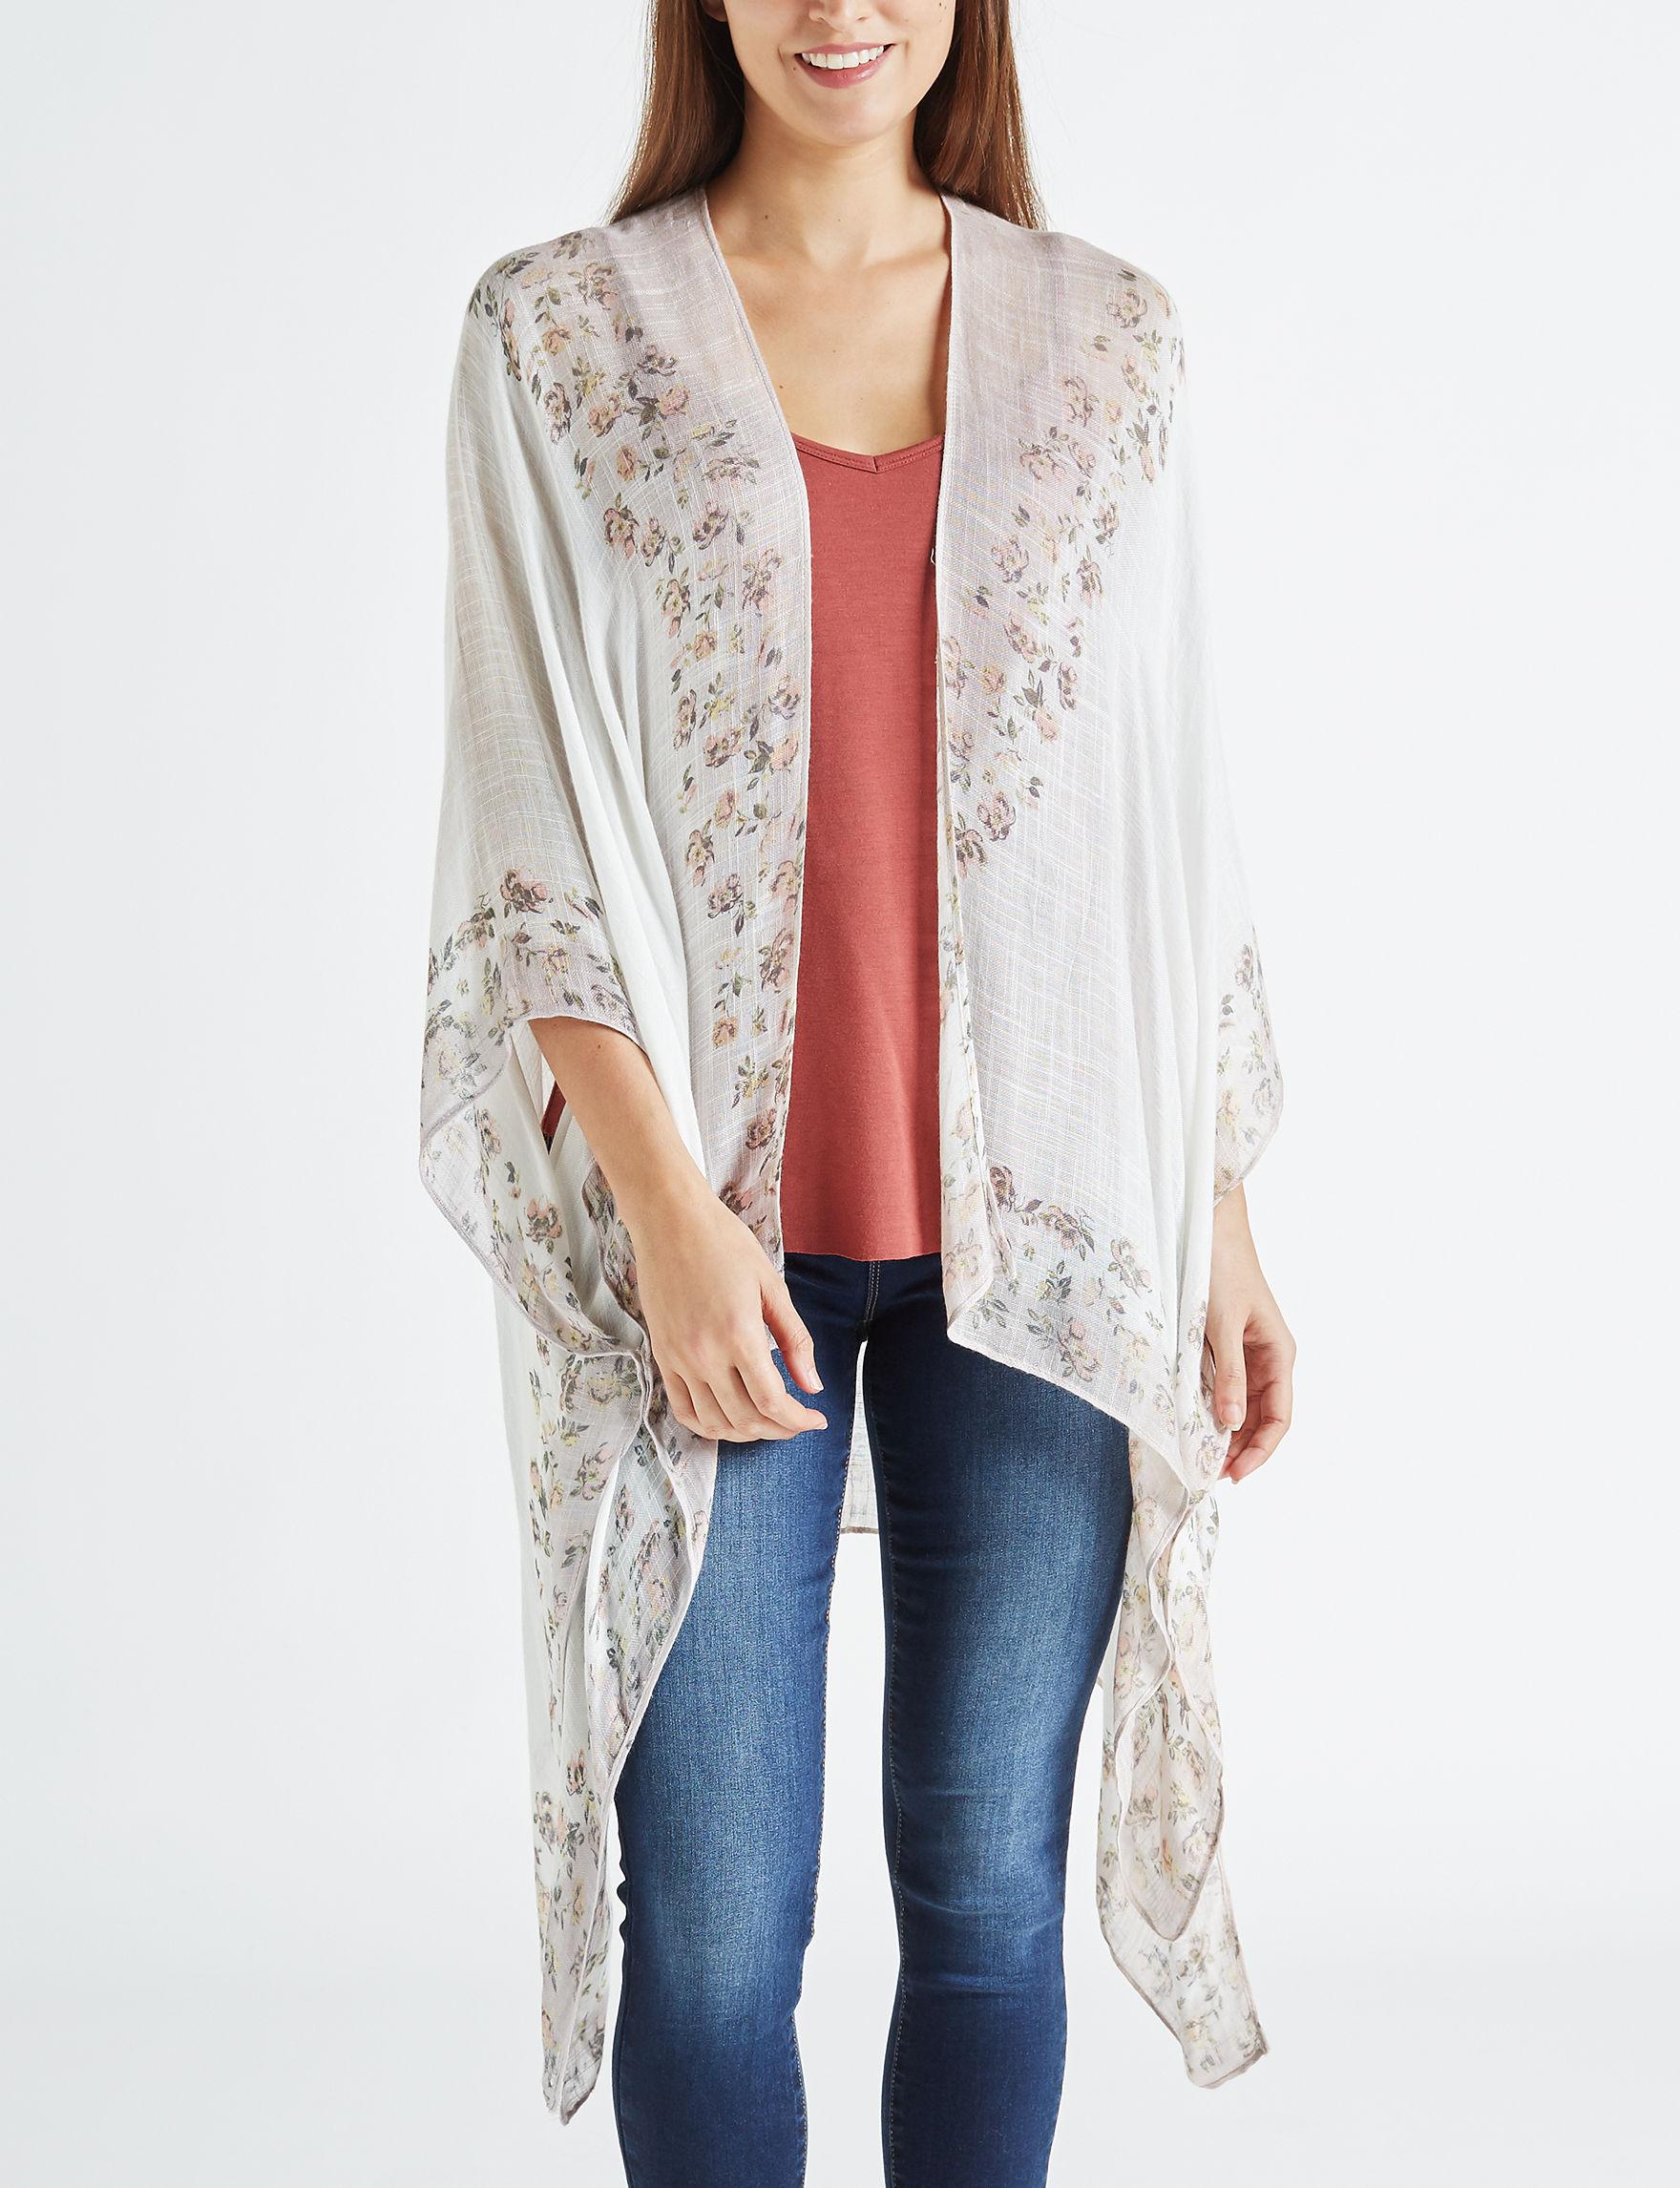 Lake Shore Drive Cream/Multi Kimonos & Toppers